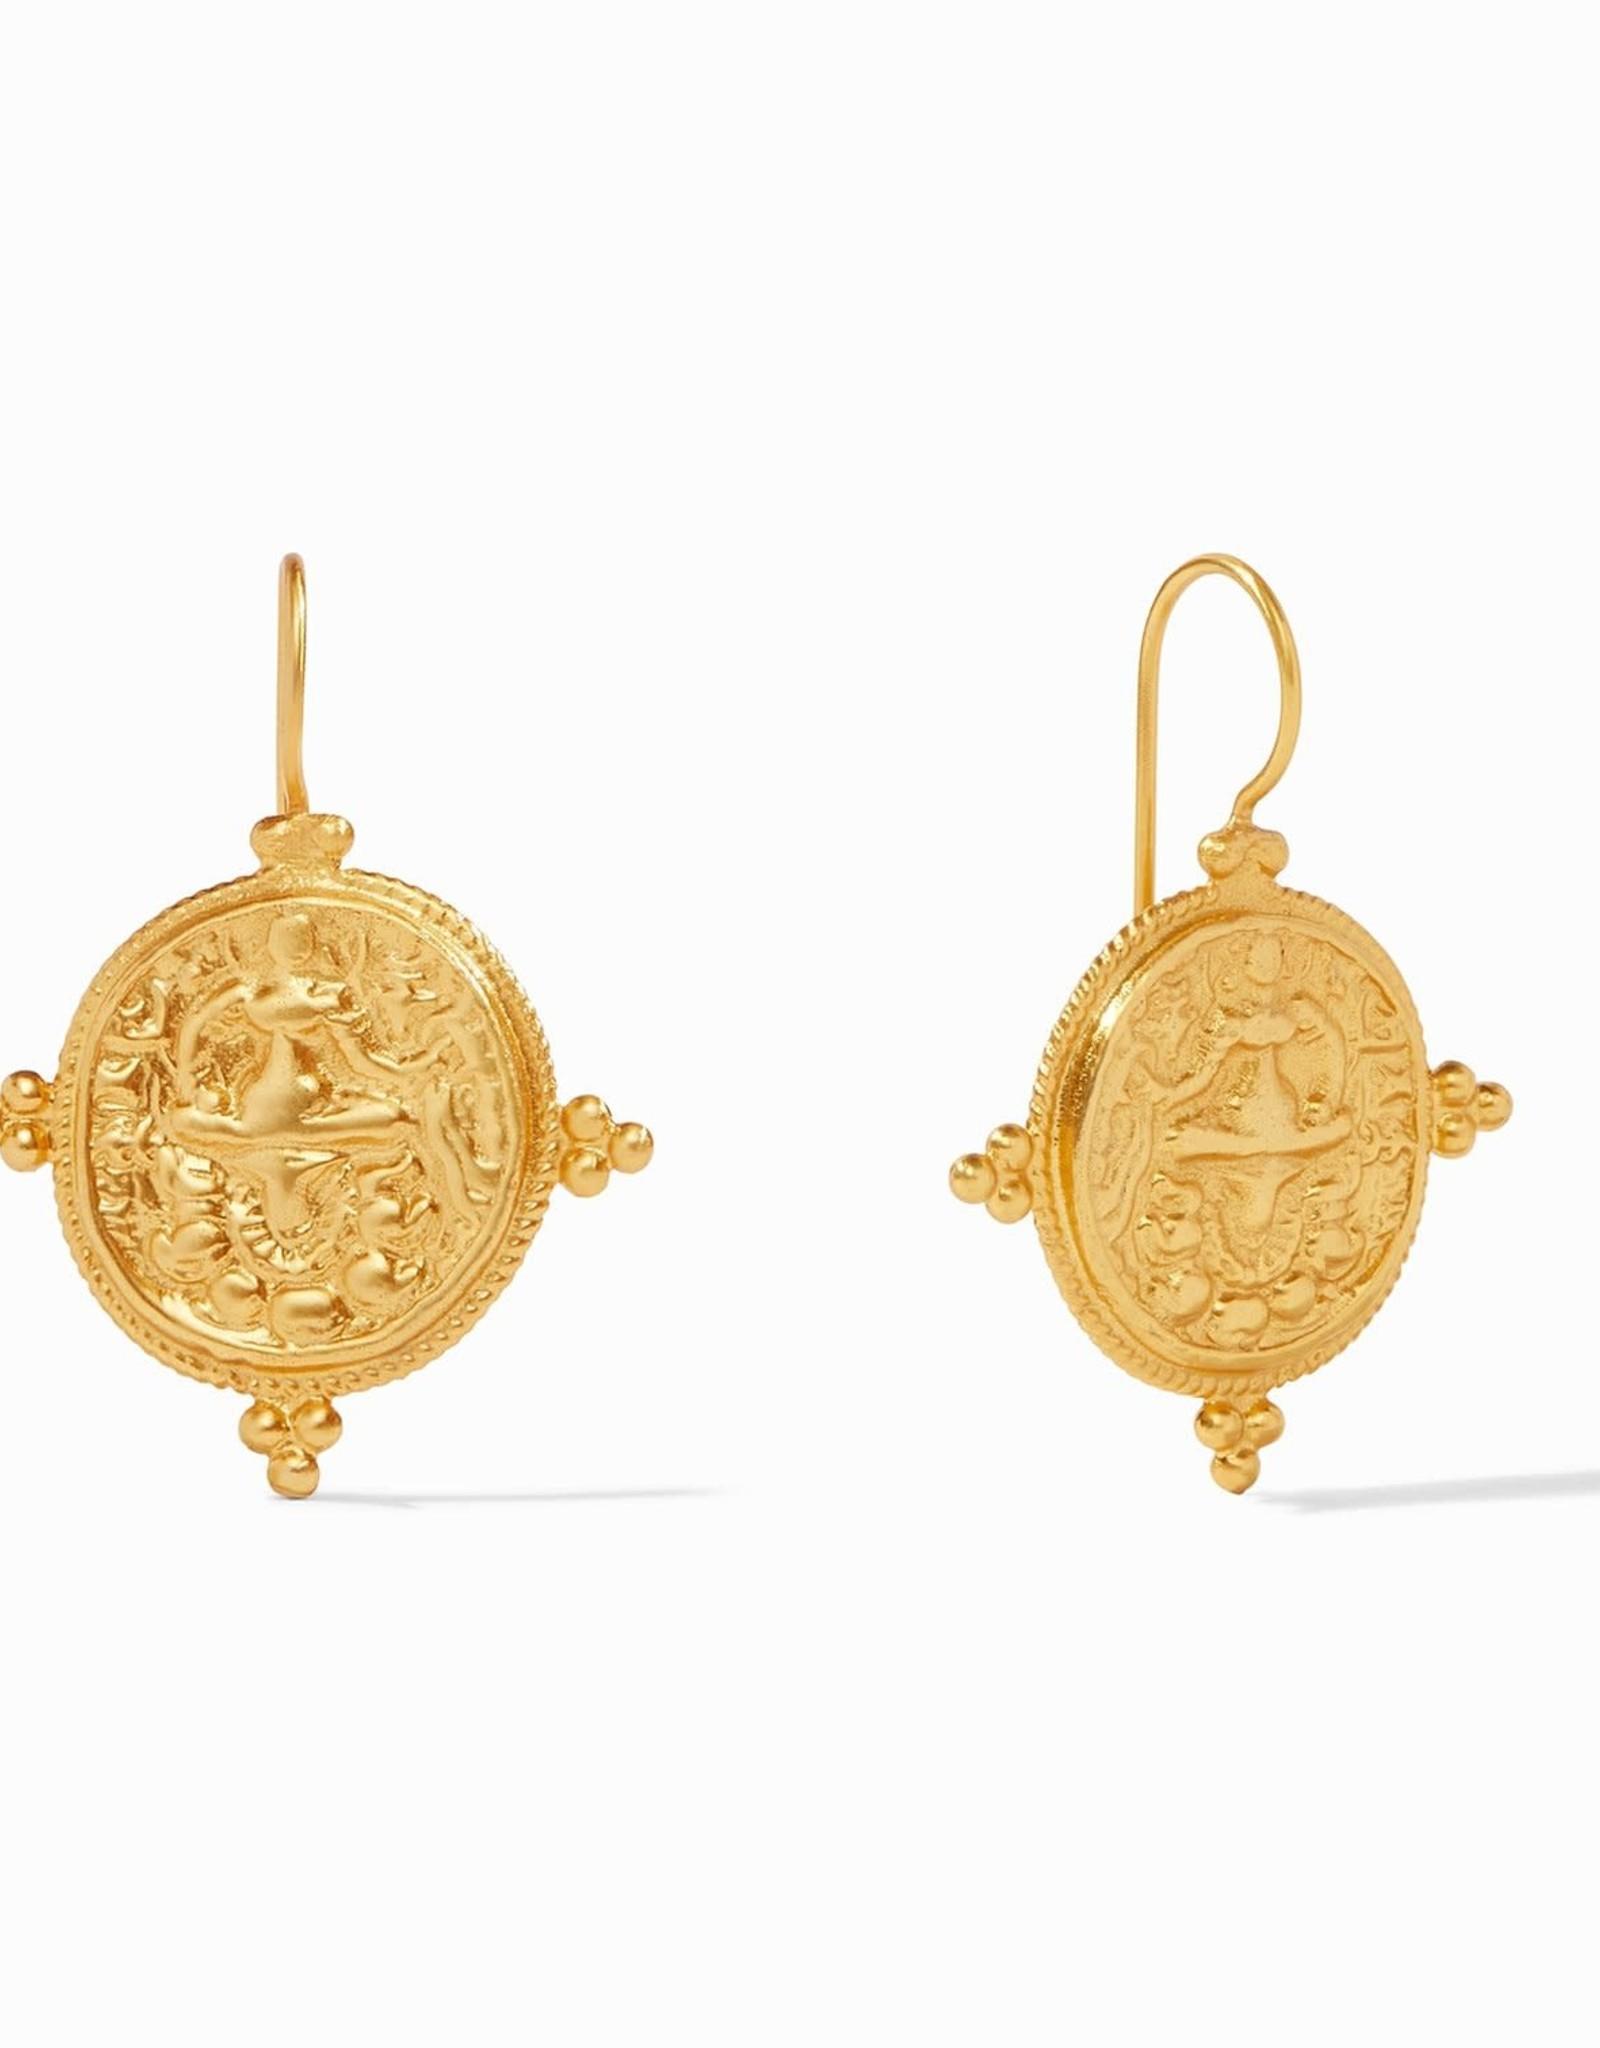 Julie Vos Quatro Coin Earring